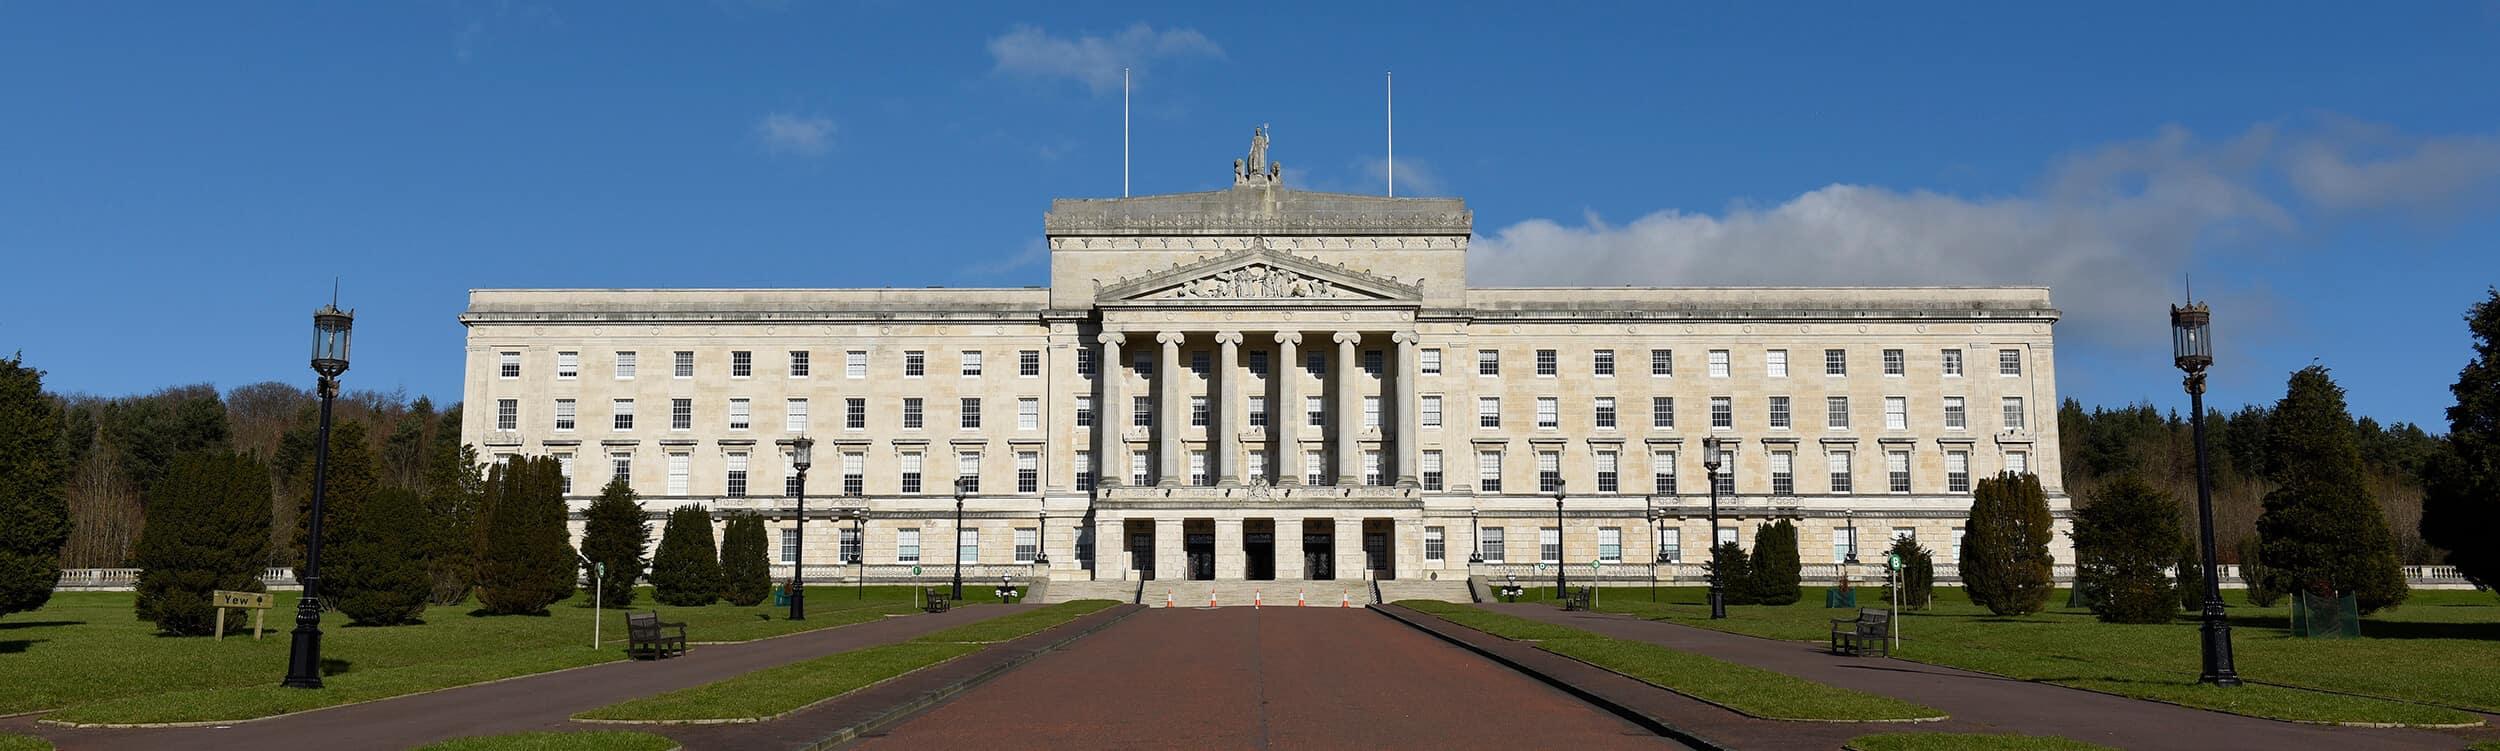 Parliament Buildings, Belfast